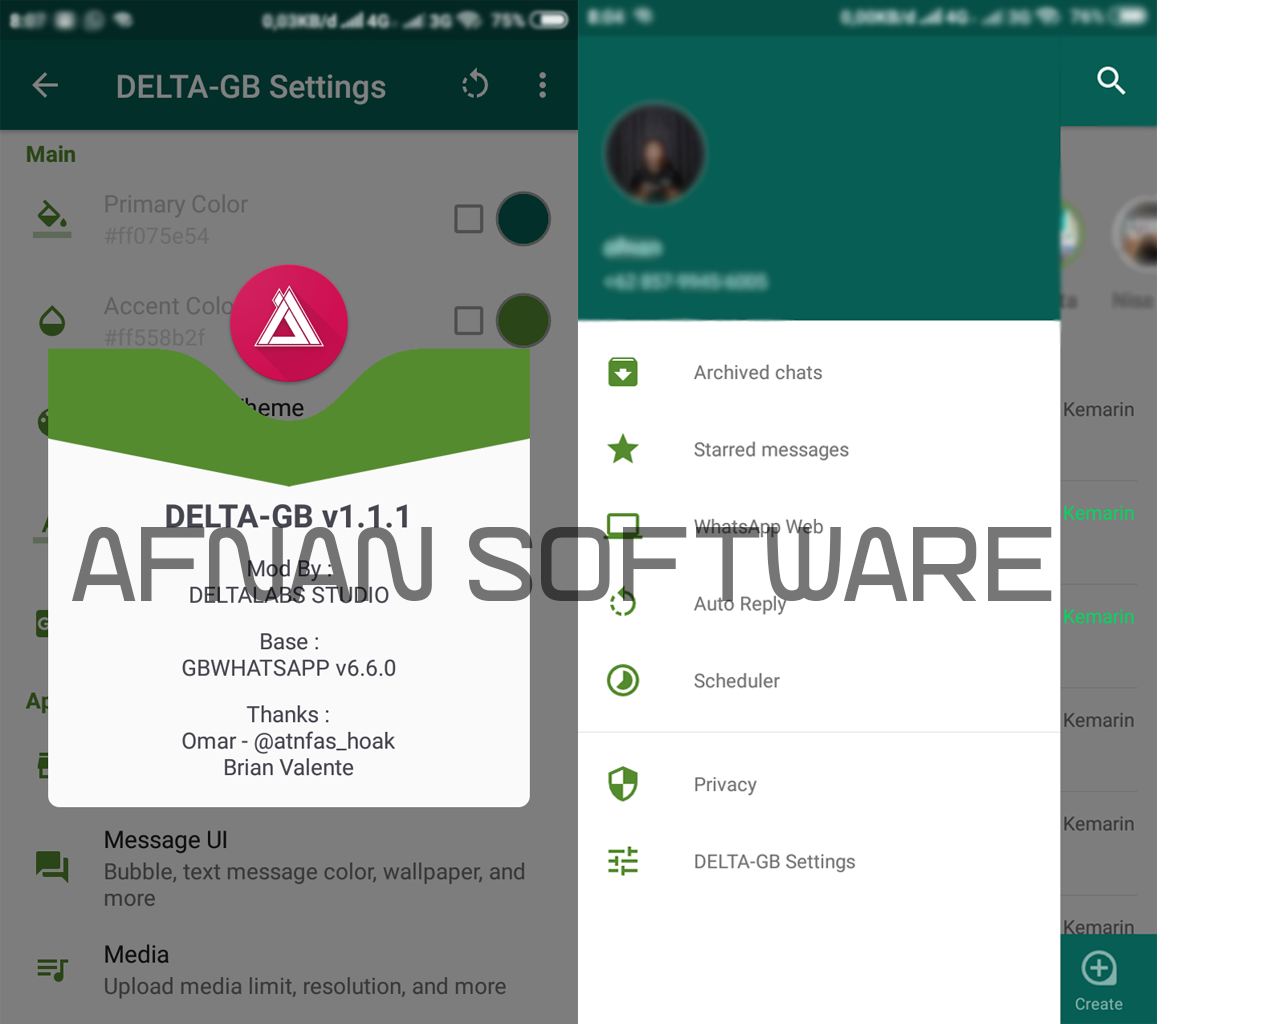 GB Whatsapp Delta MOD APK Versi 1 1 1 Terbaru 2019